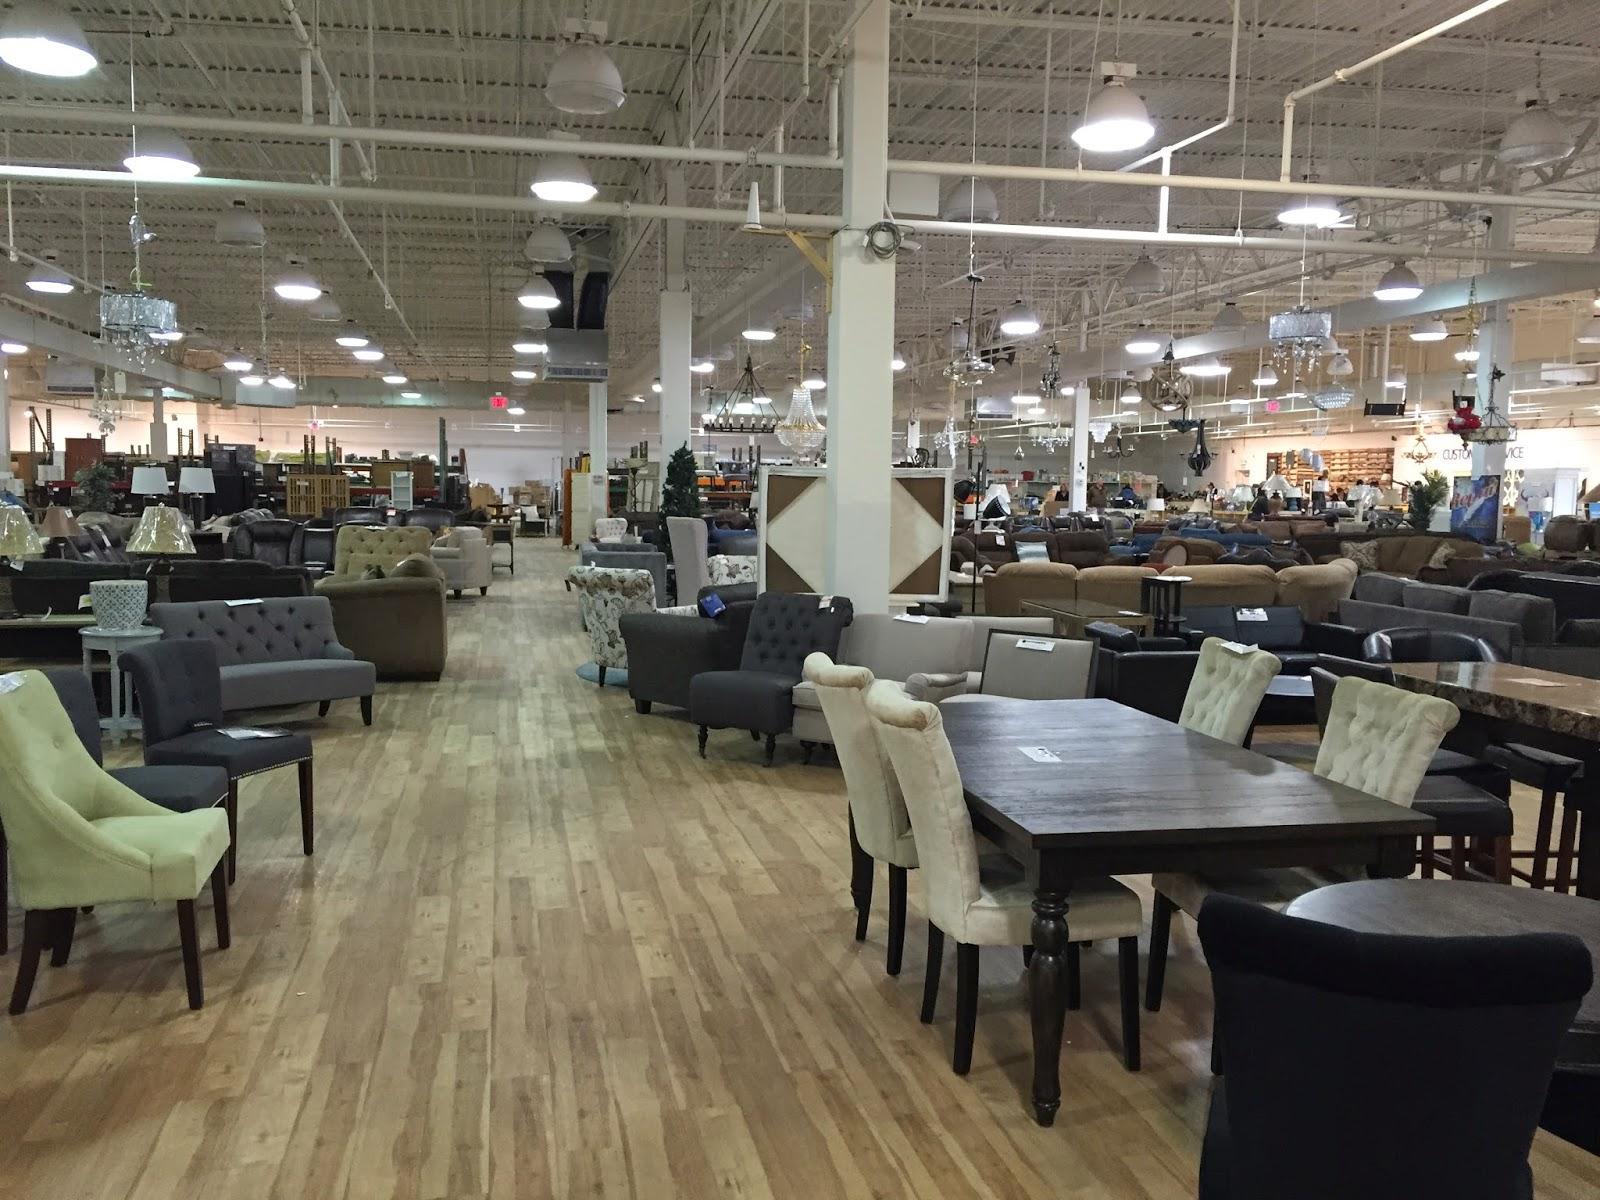 Bargains Buyouts Cincinnatis Best Kept Secret Simply Sarah Style